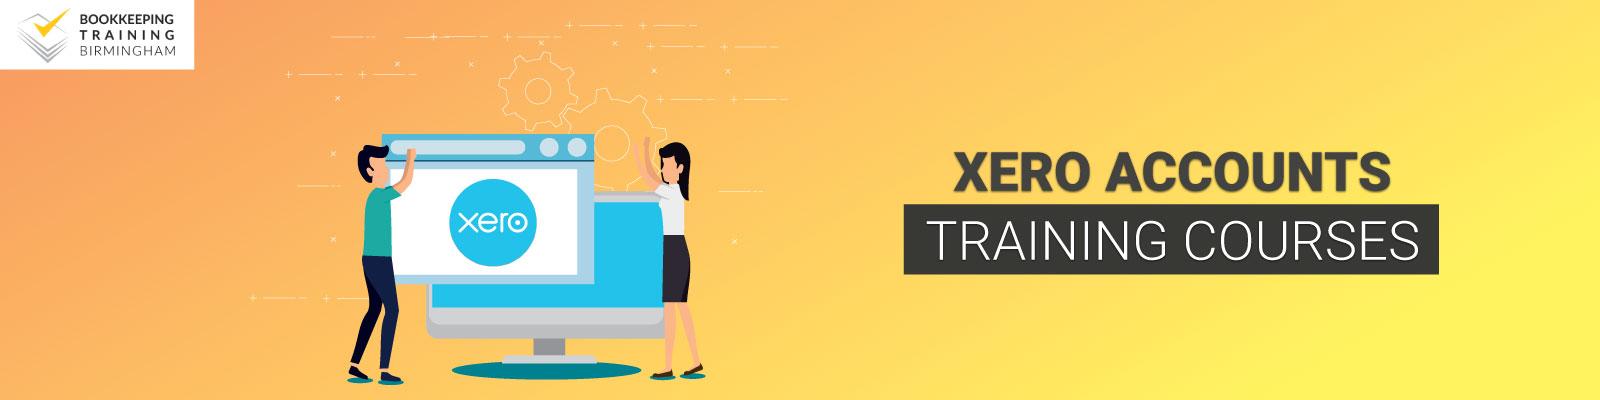 xero-accounts-training